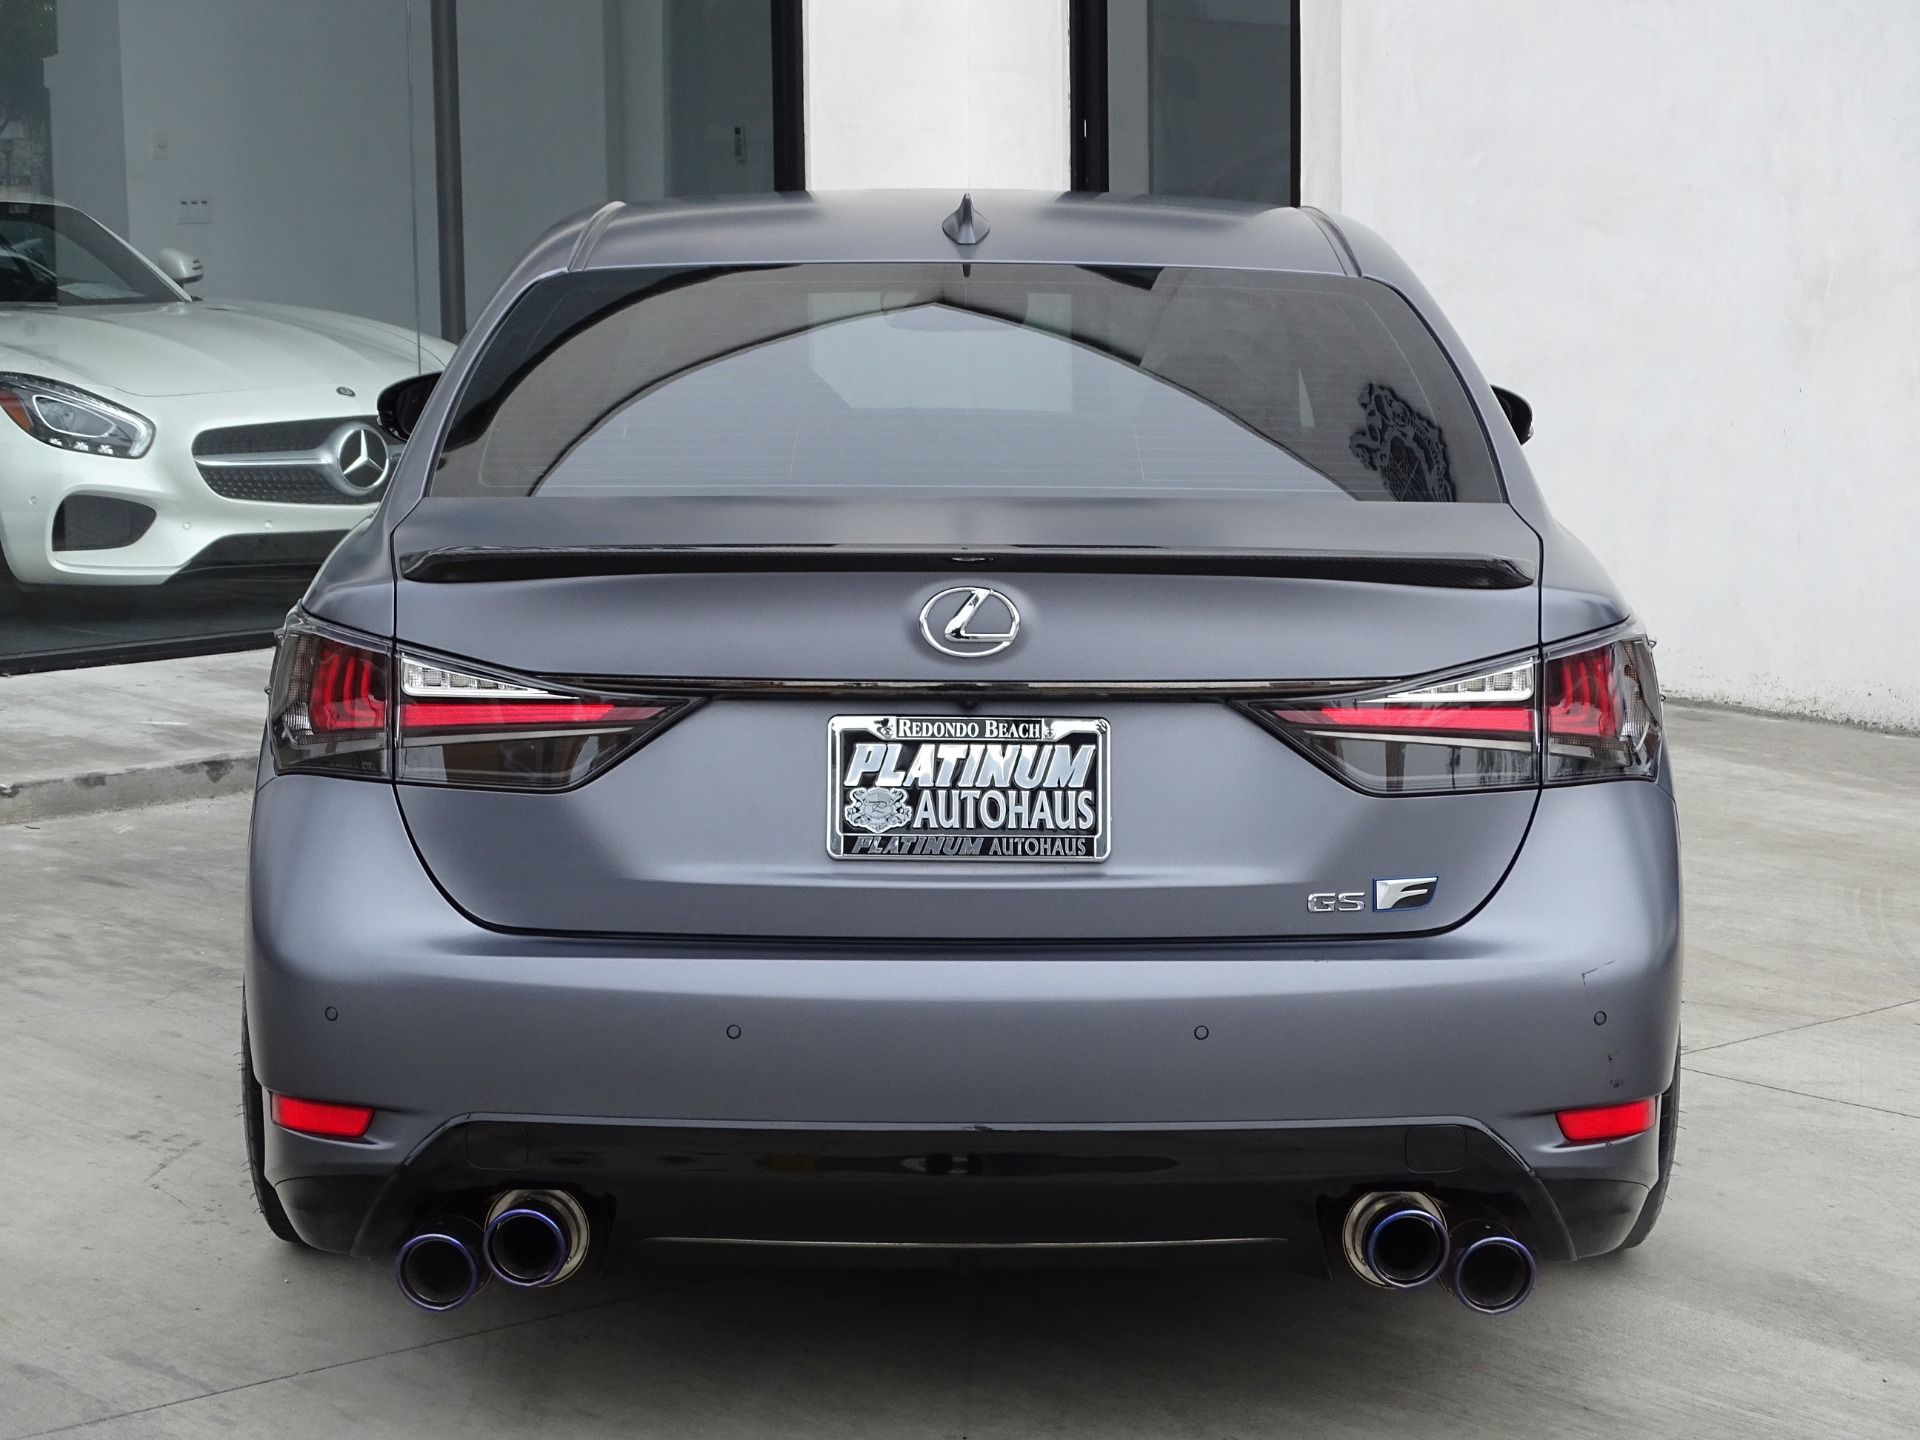 2019 Lexus GS F Stock # 6321A for sale near Redondo Beach ...